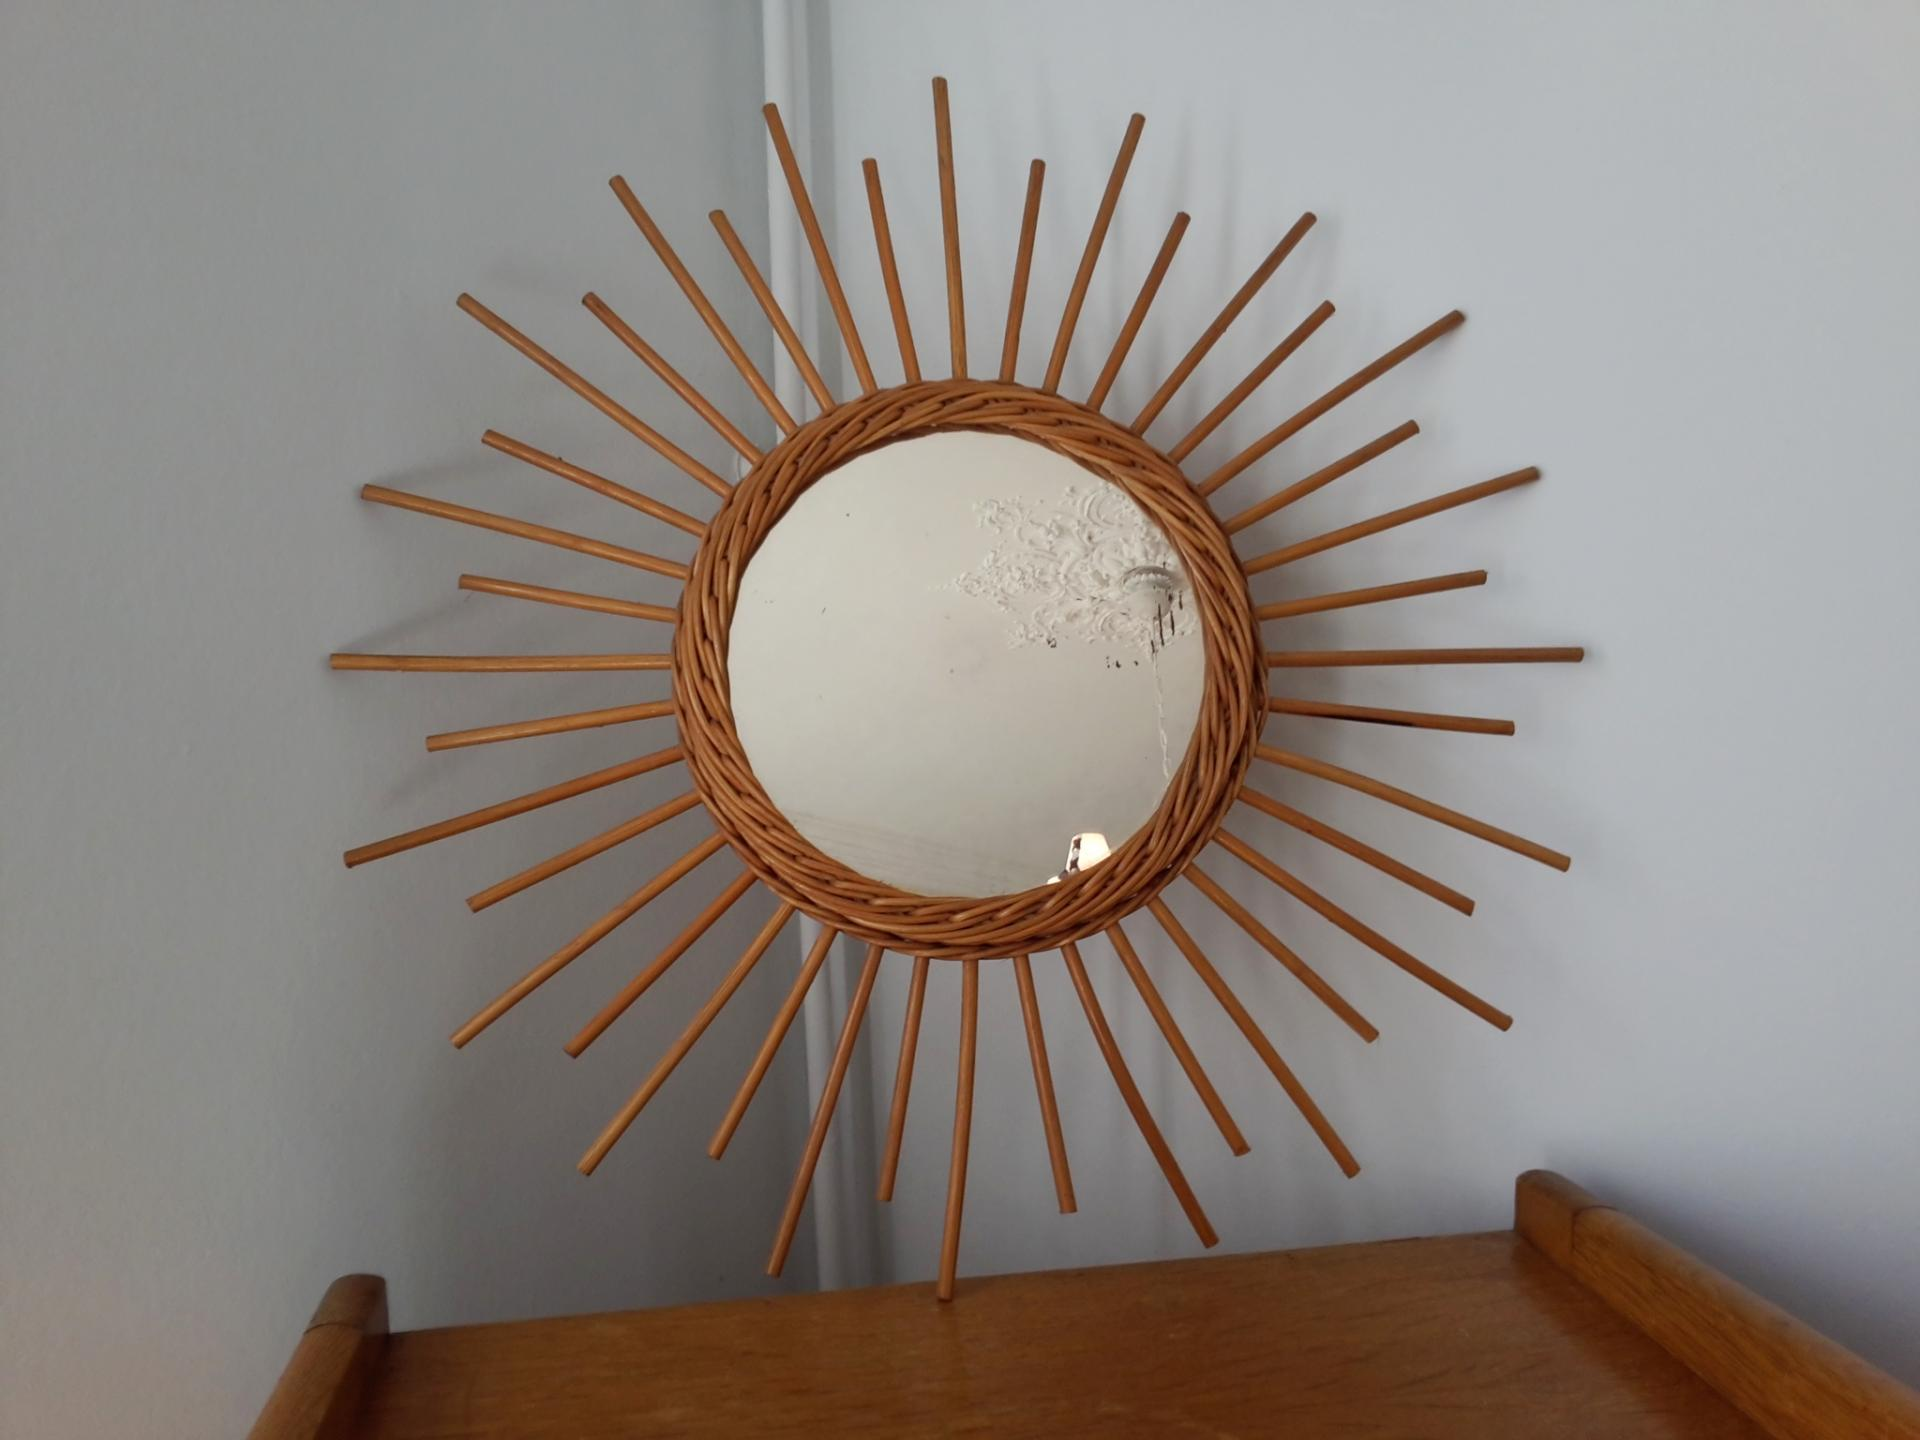 Miroir soleil vintage en osier for Miroir soleil prix